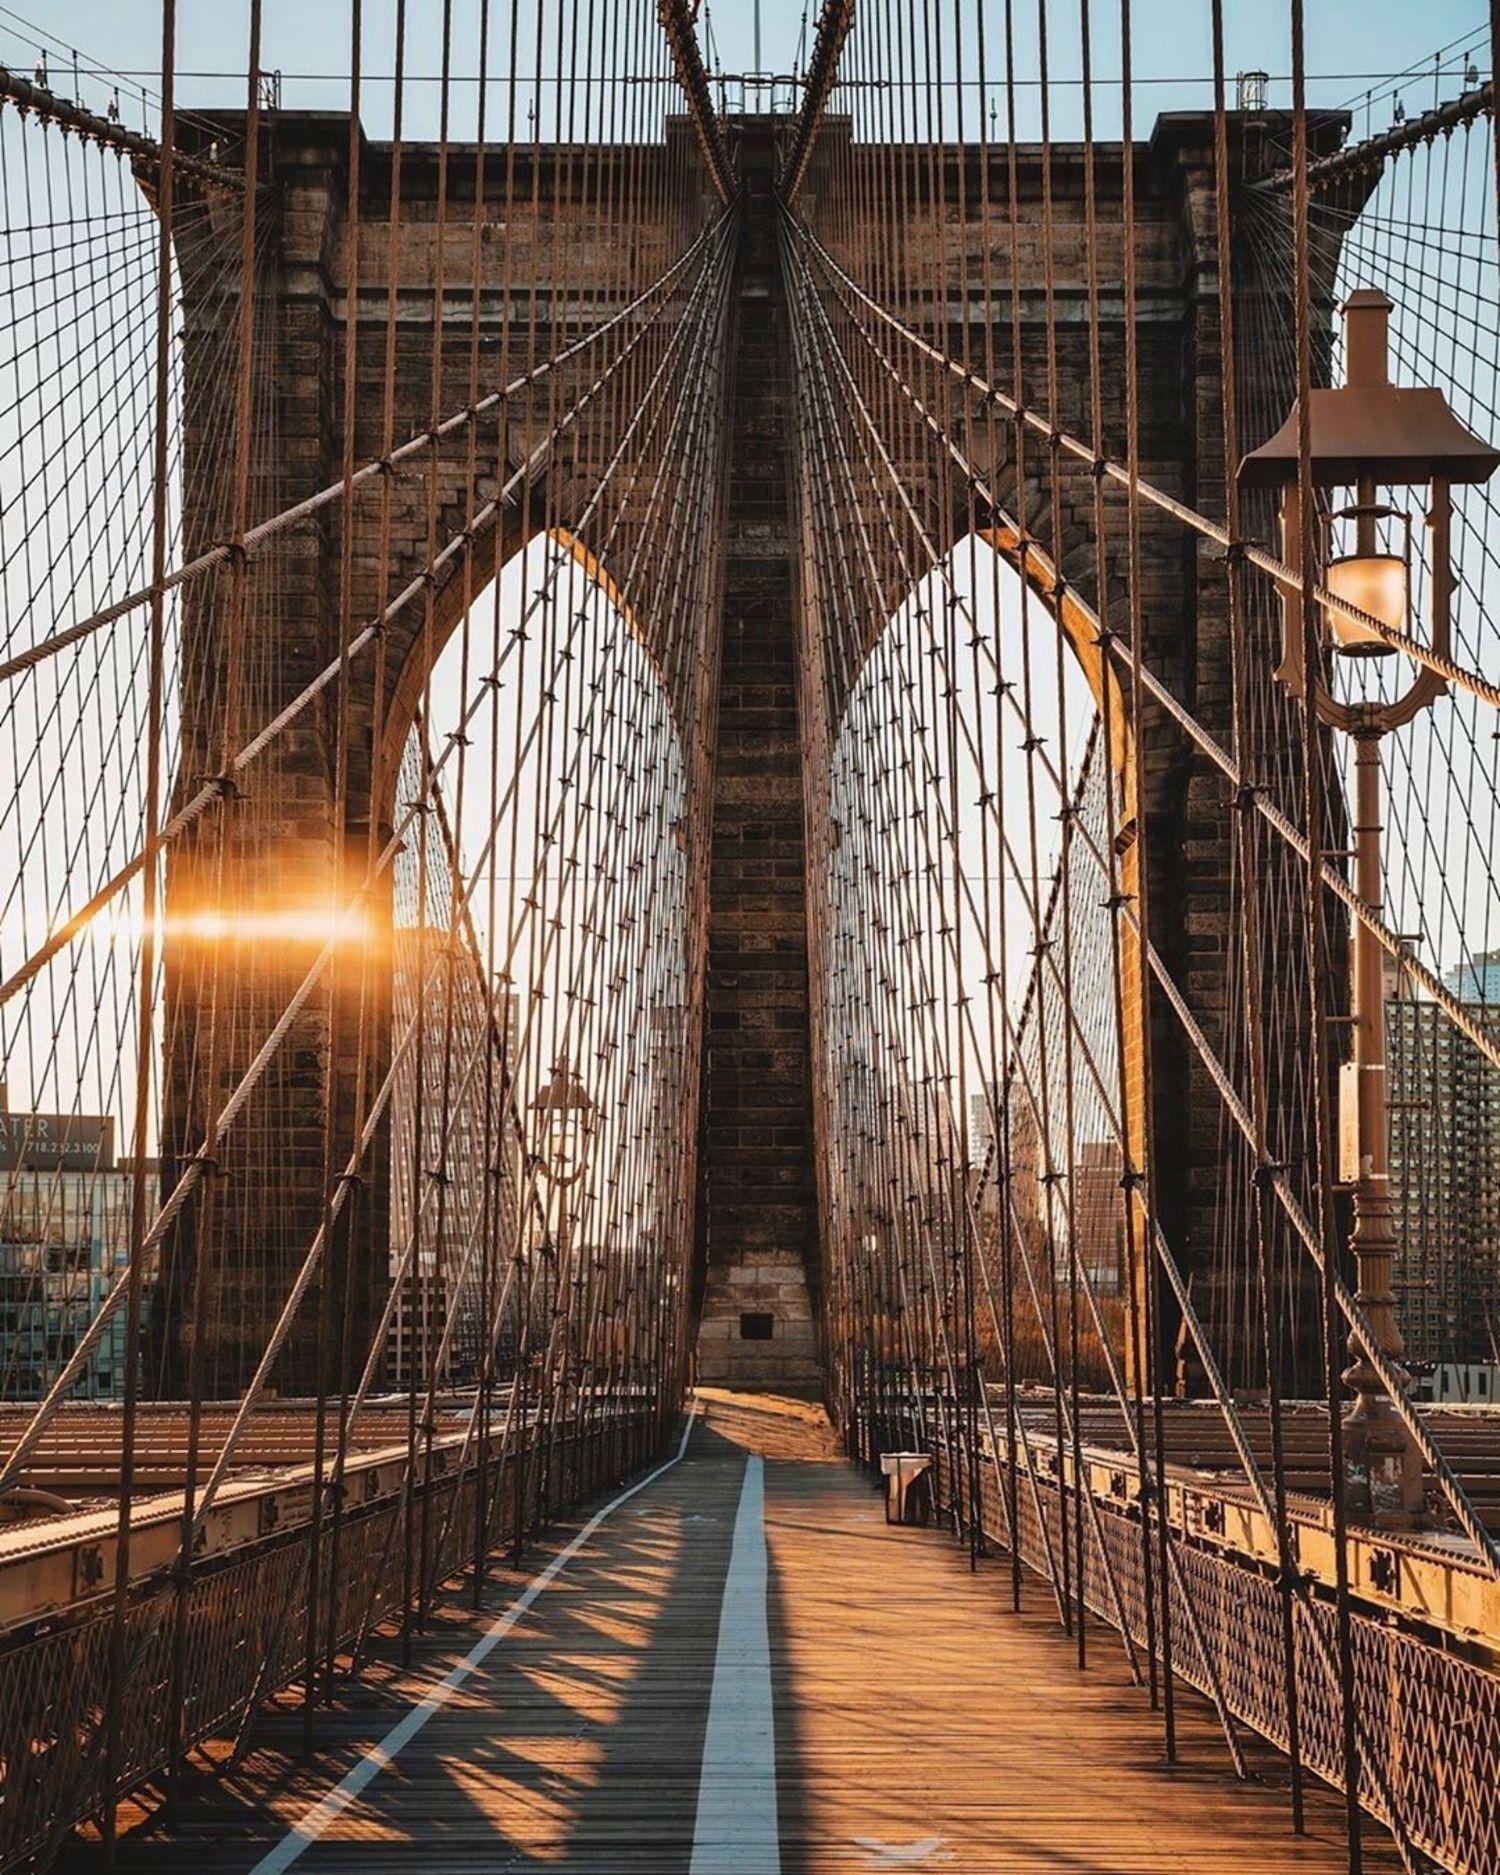 Sunrise on the Brooklyn Bridge. Photo via @joethommas #viewingnyc #nyc #newyork #newyorkcity #brooklynbridge #sunrise